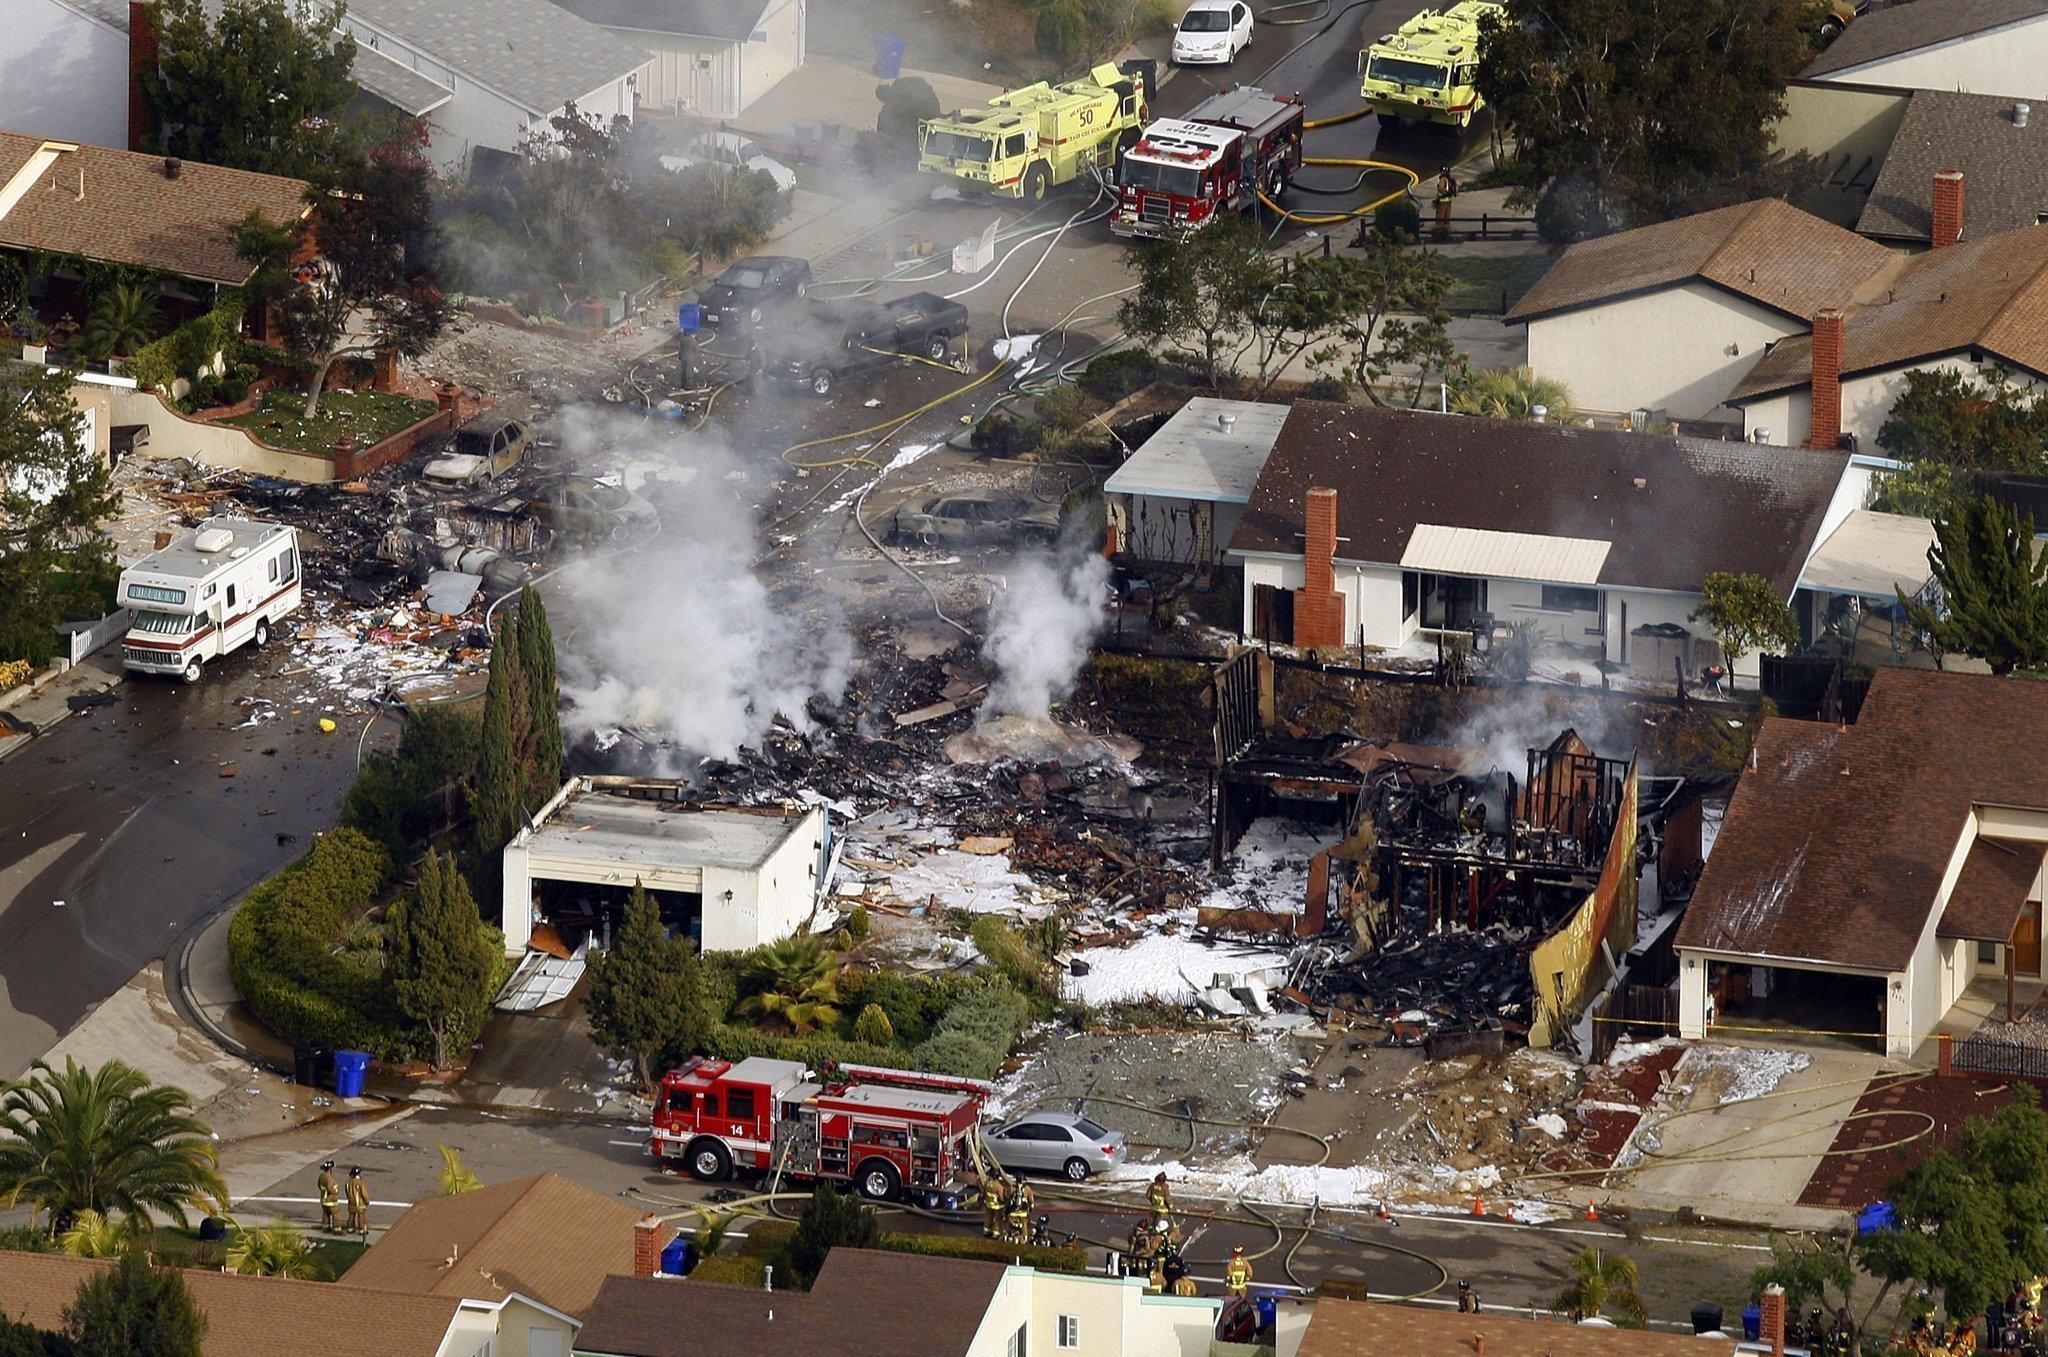 San Diego Law School >> Decades separate tragic San Diego jet crashes - The San ...